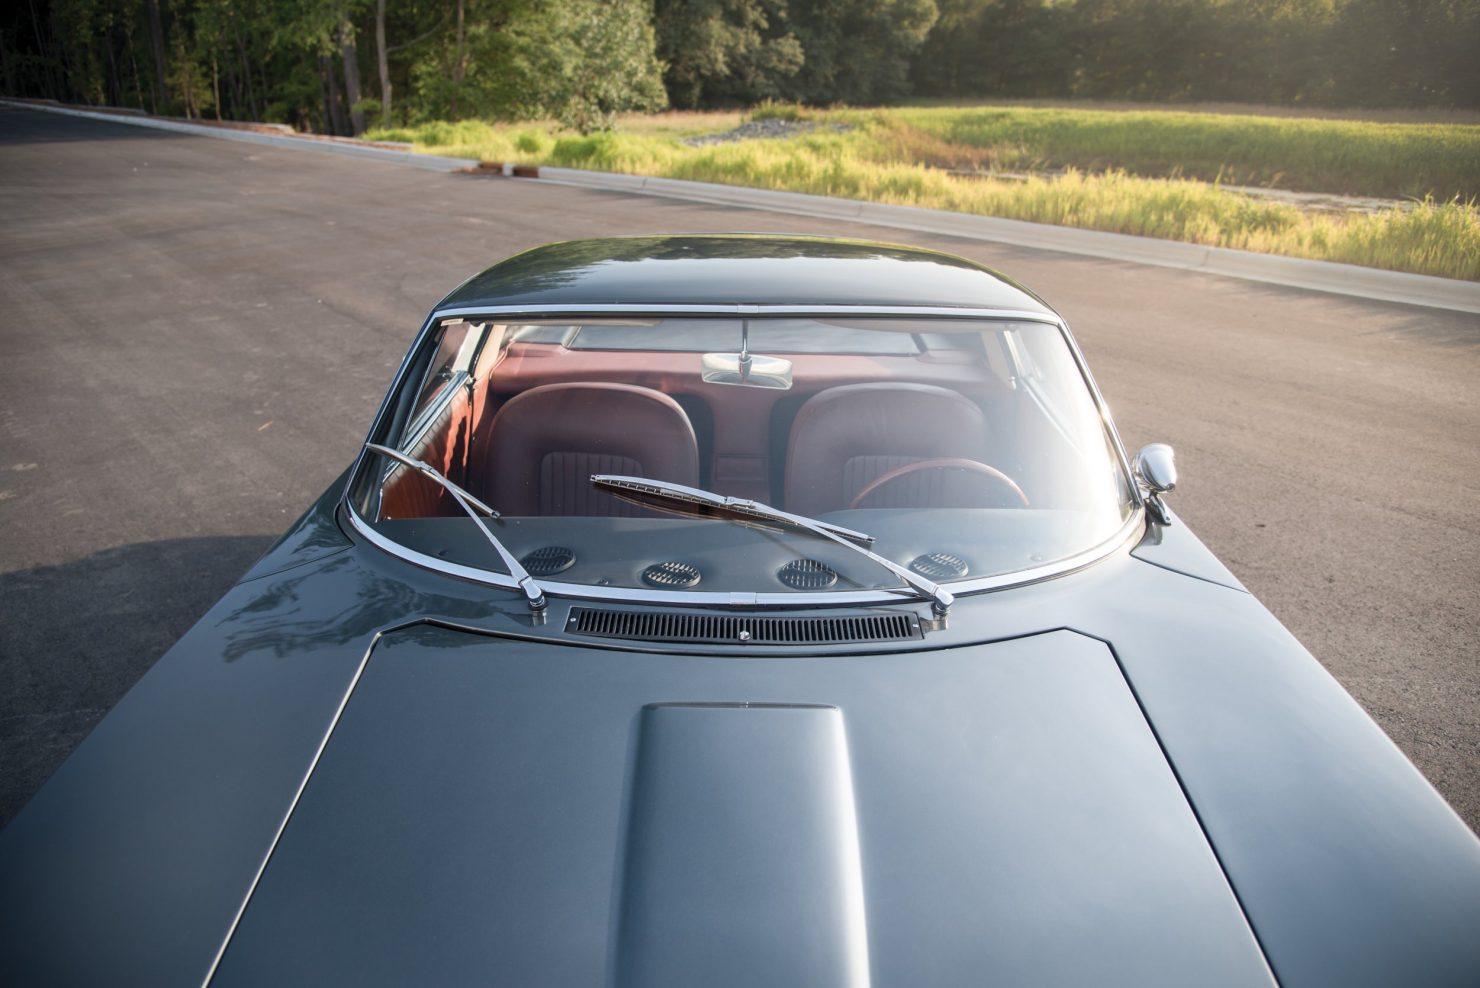 iso grifo car 21 1480x988 - 1966 Iso Grifo GL Series I